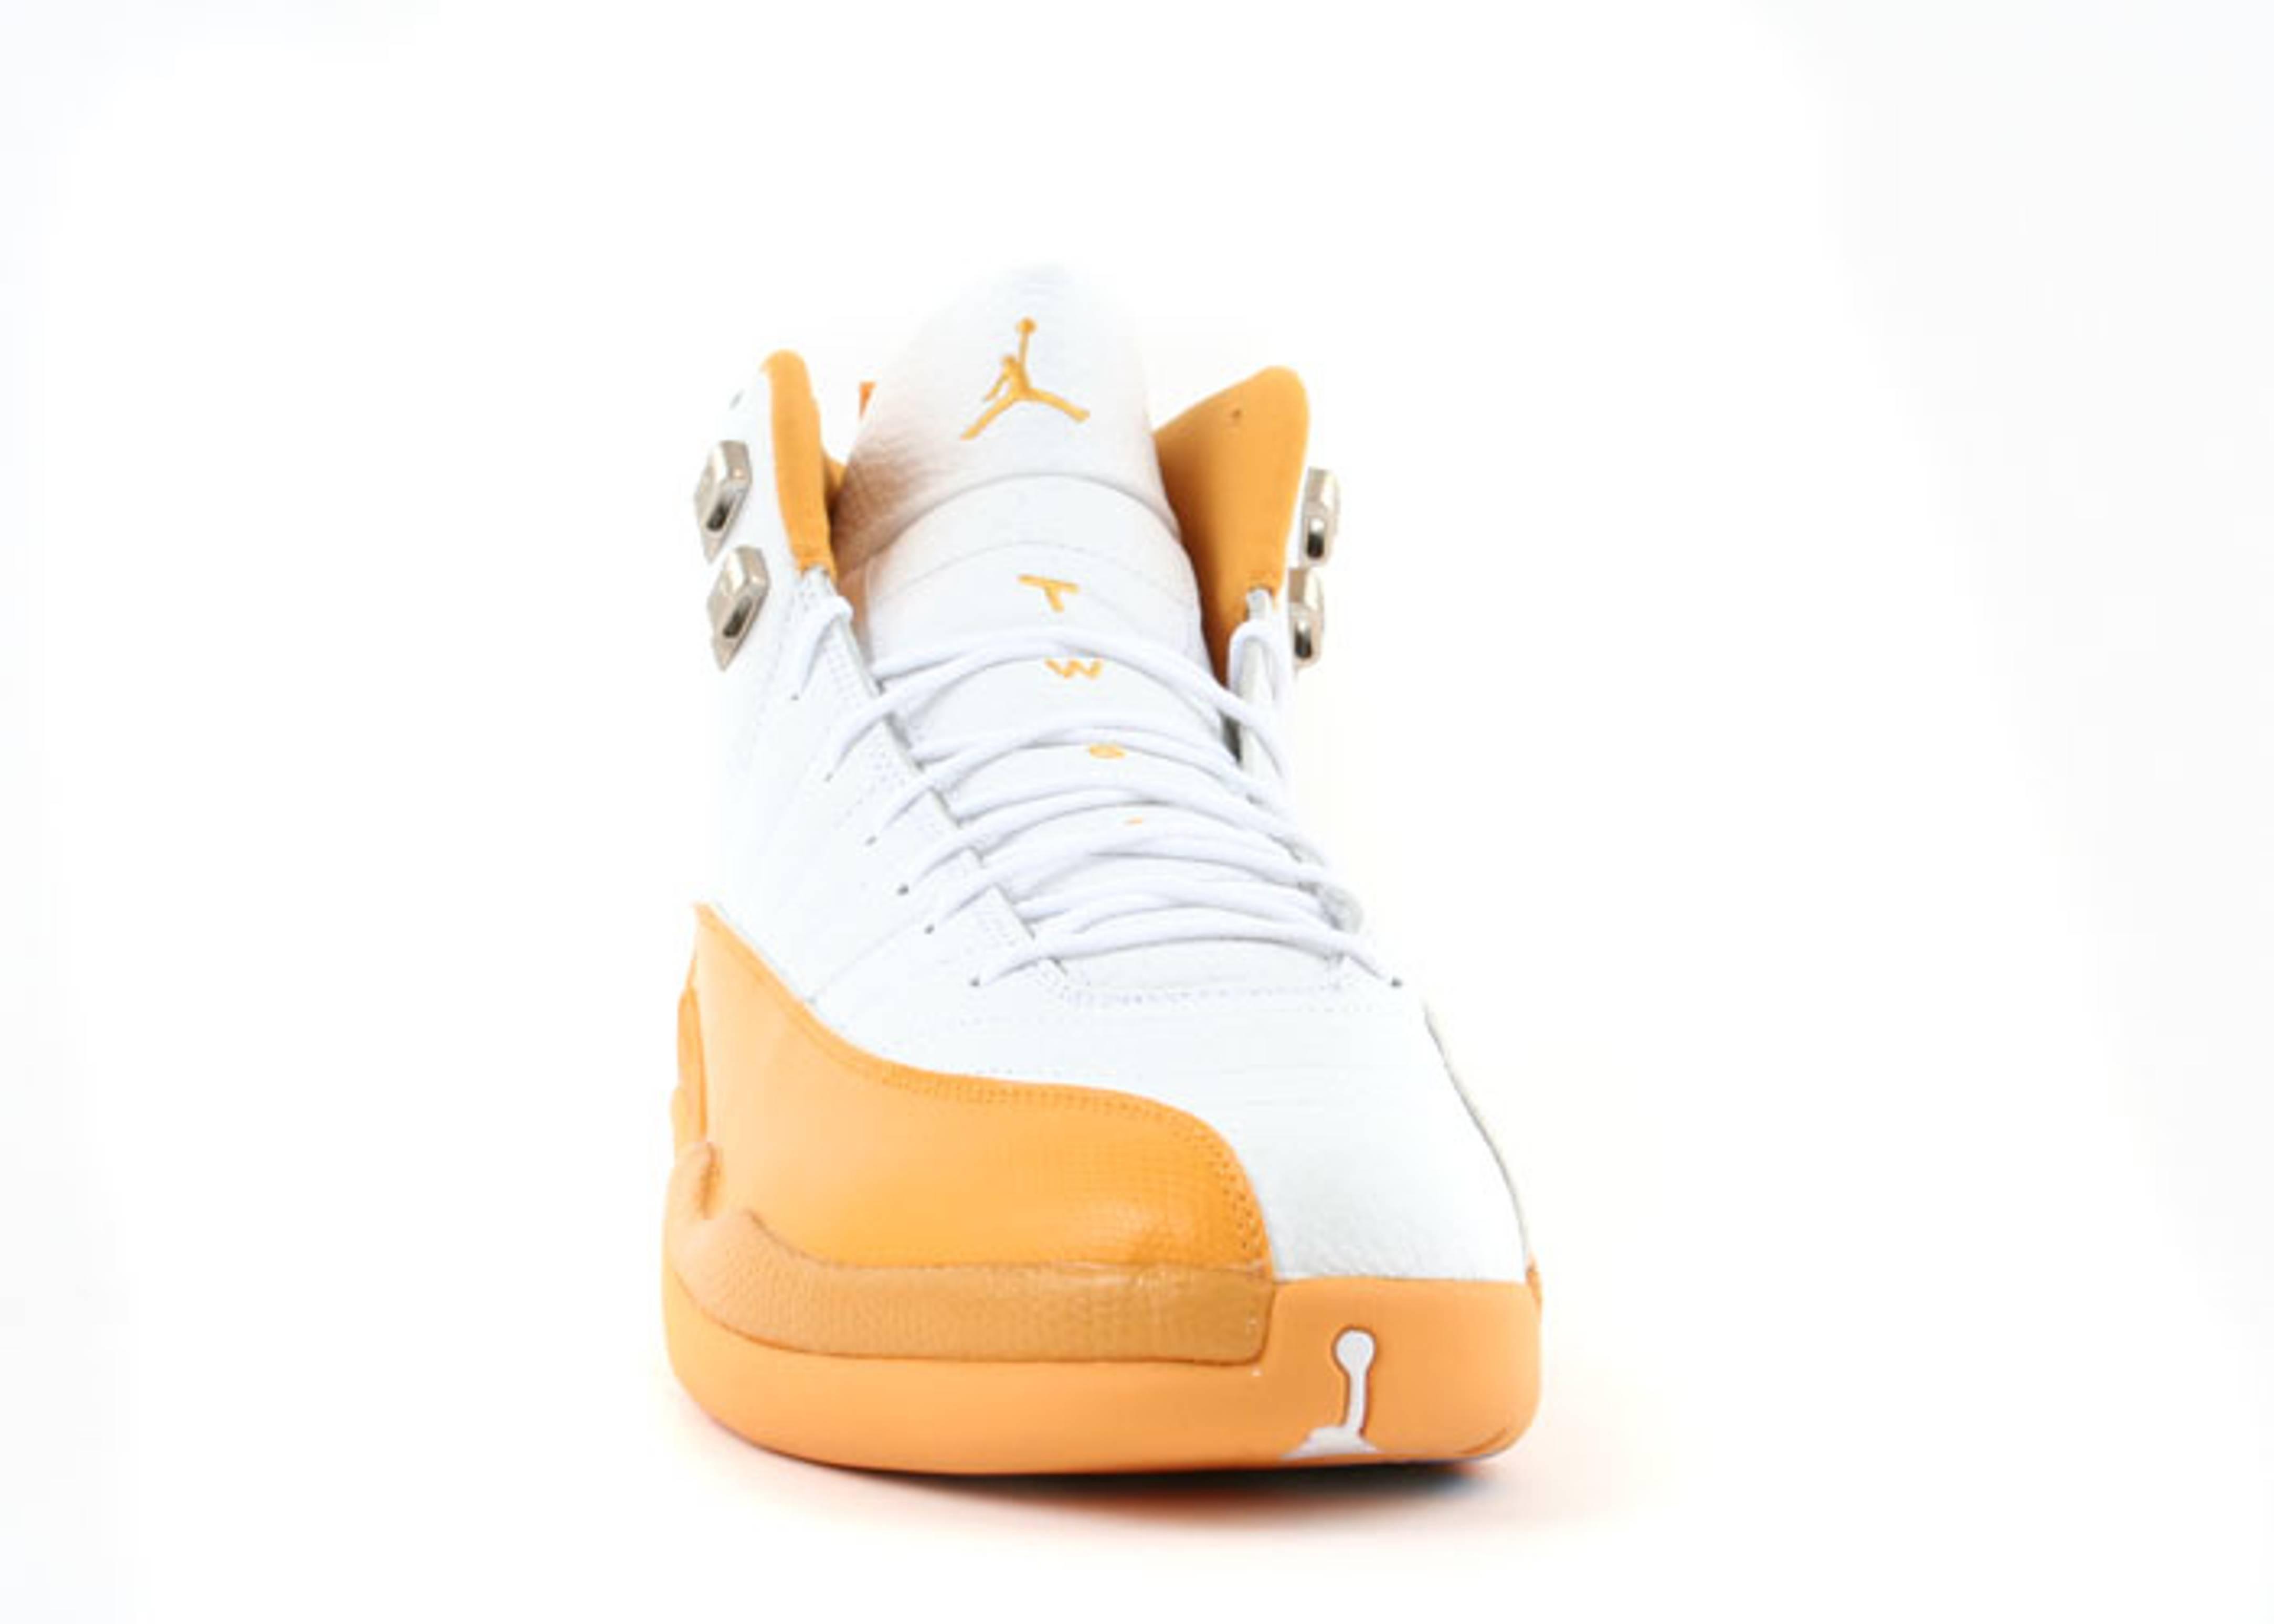 separation shoes c6f7c b8ec0 Air Jordan 12 Retro